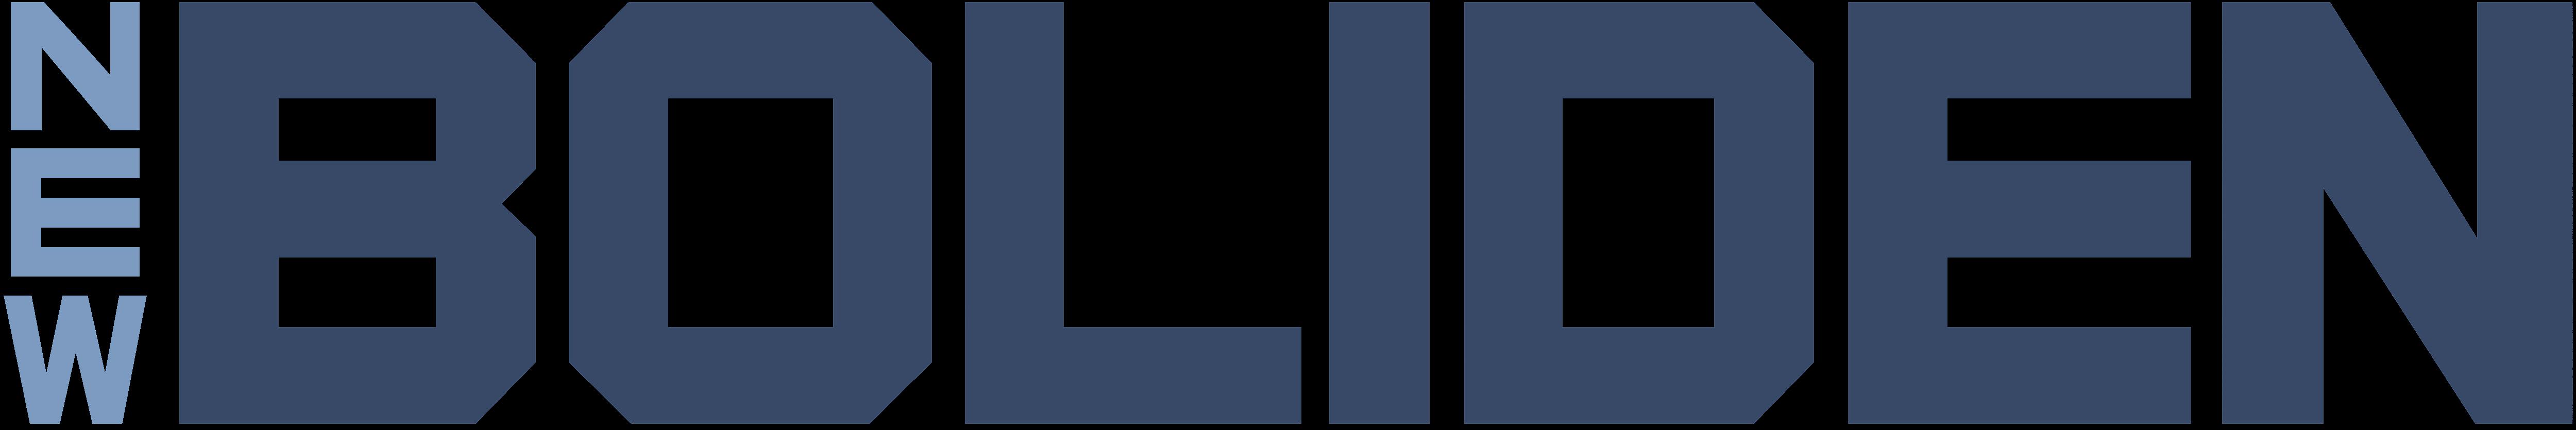 boliden logos download twitter logo transparent black twitter logo transparent stick png